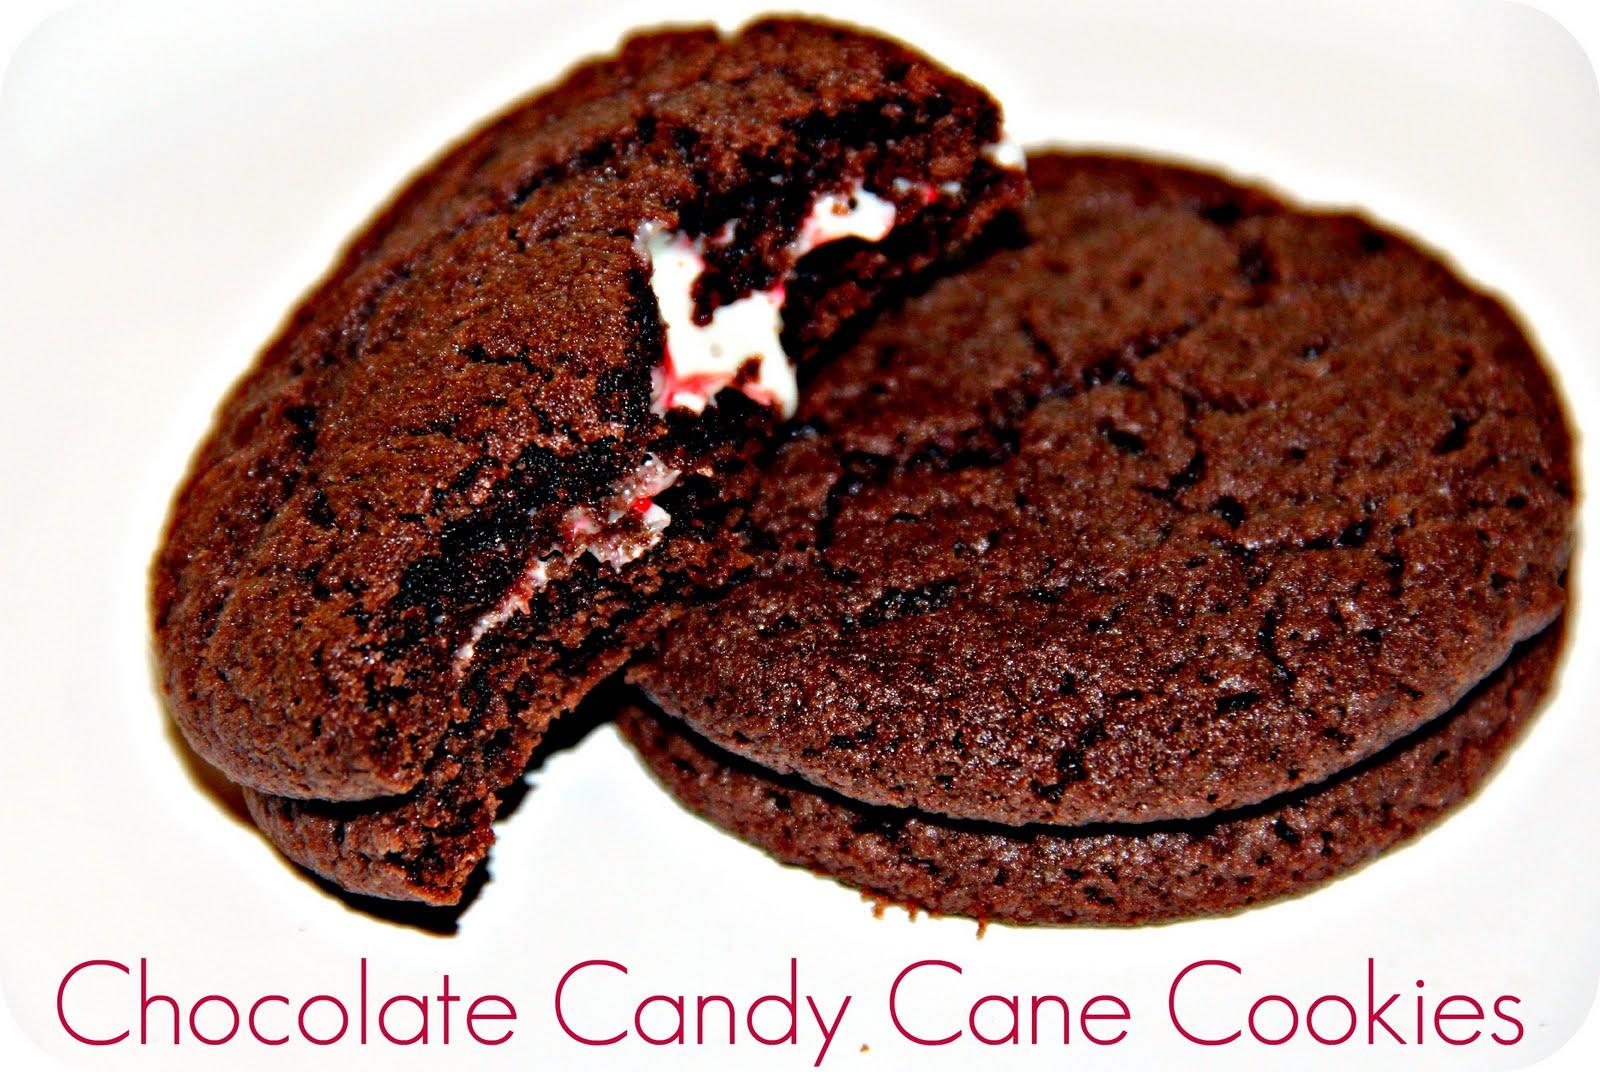 Blue Skies Ahead: Chocolate Candy Cane Cookies